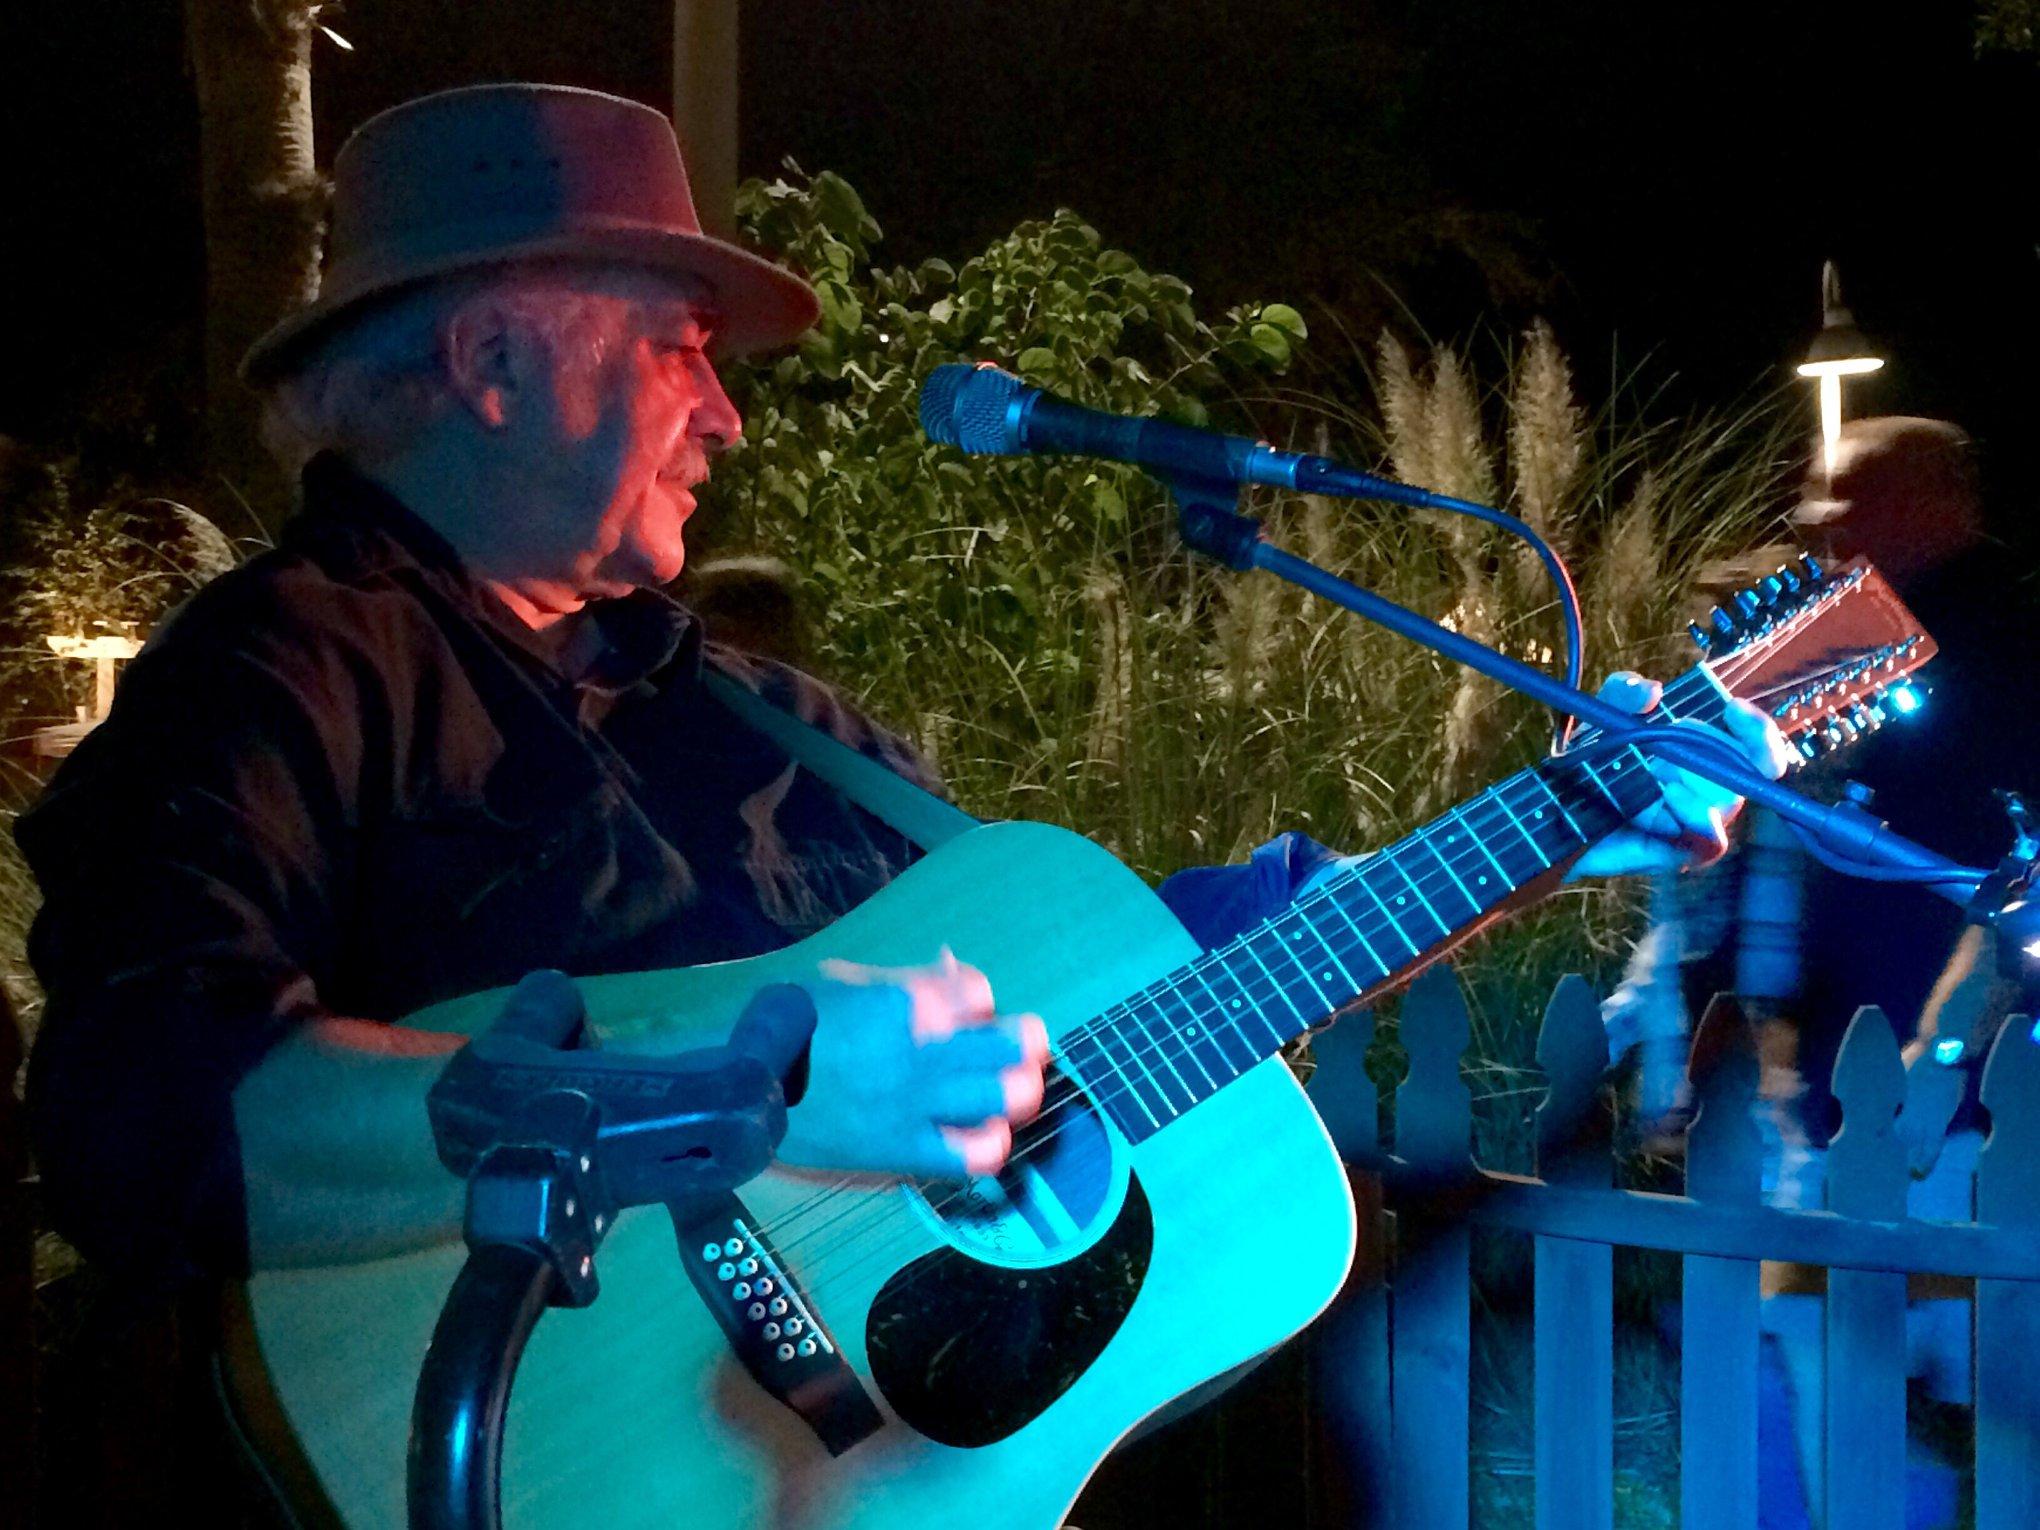 A man playing a guitar in a blue haze of lights.